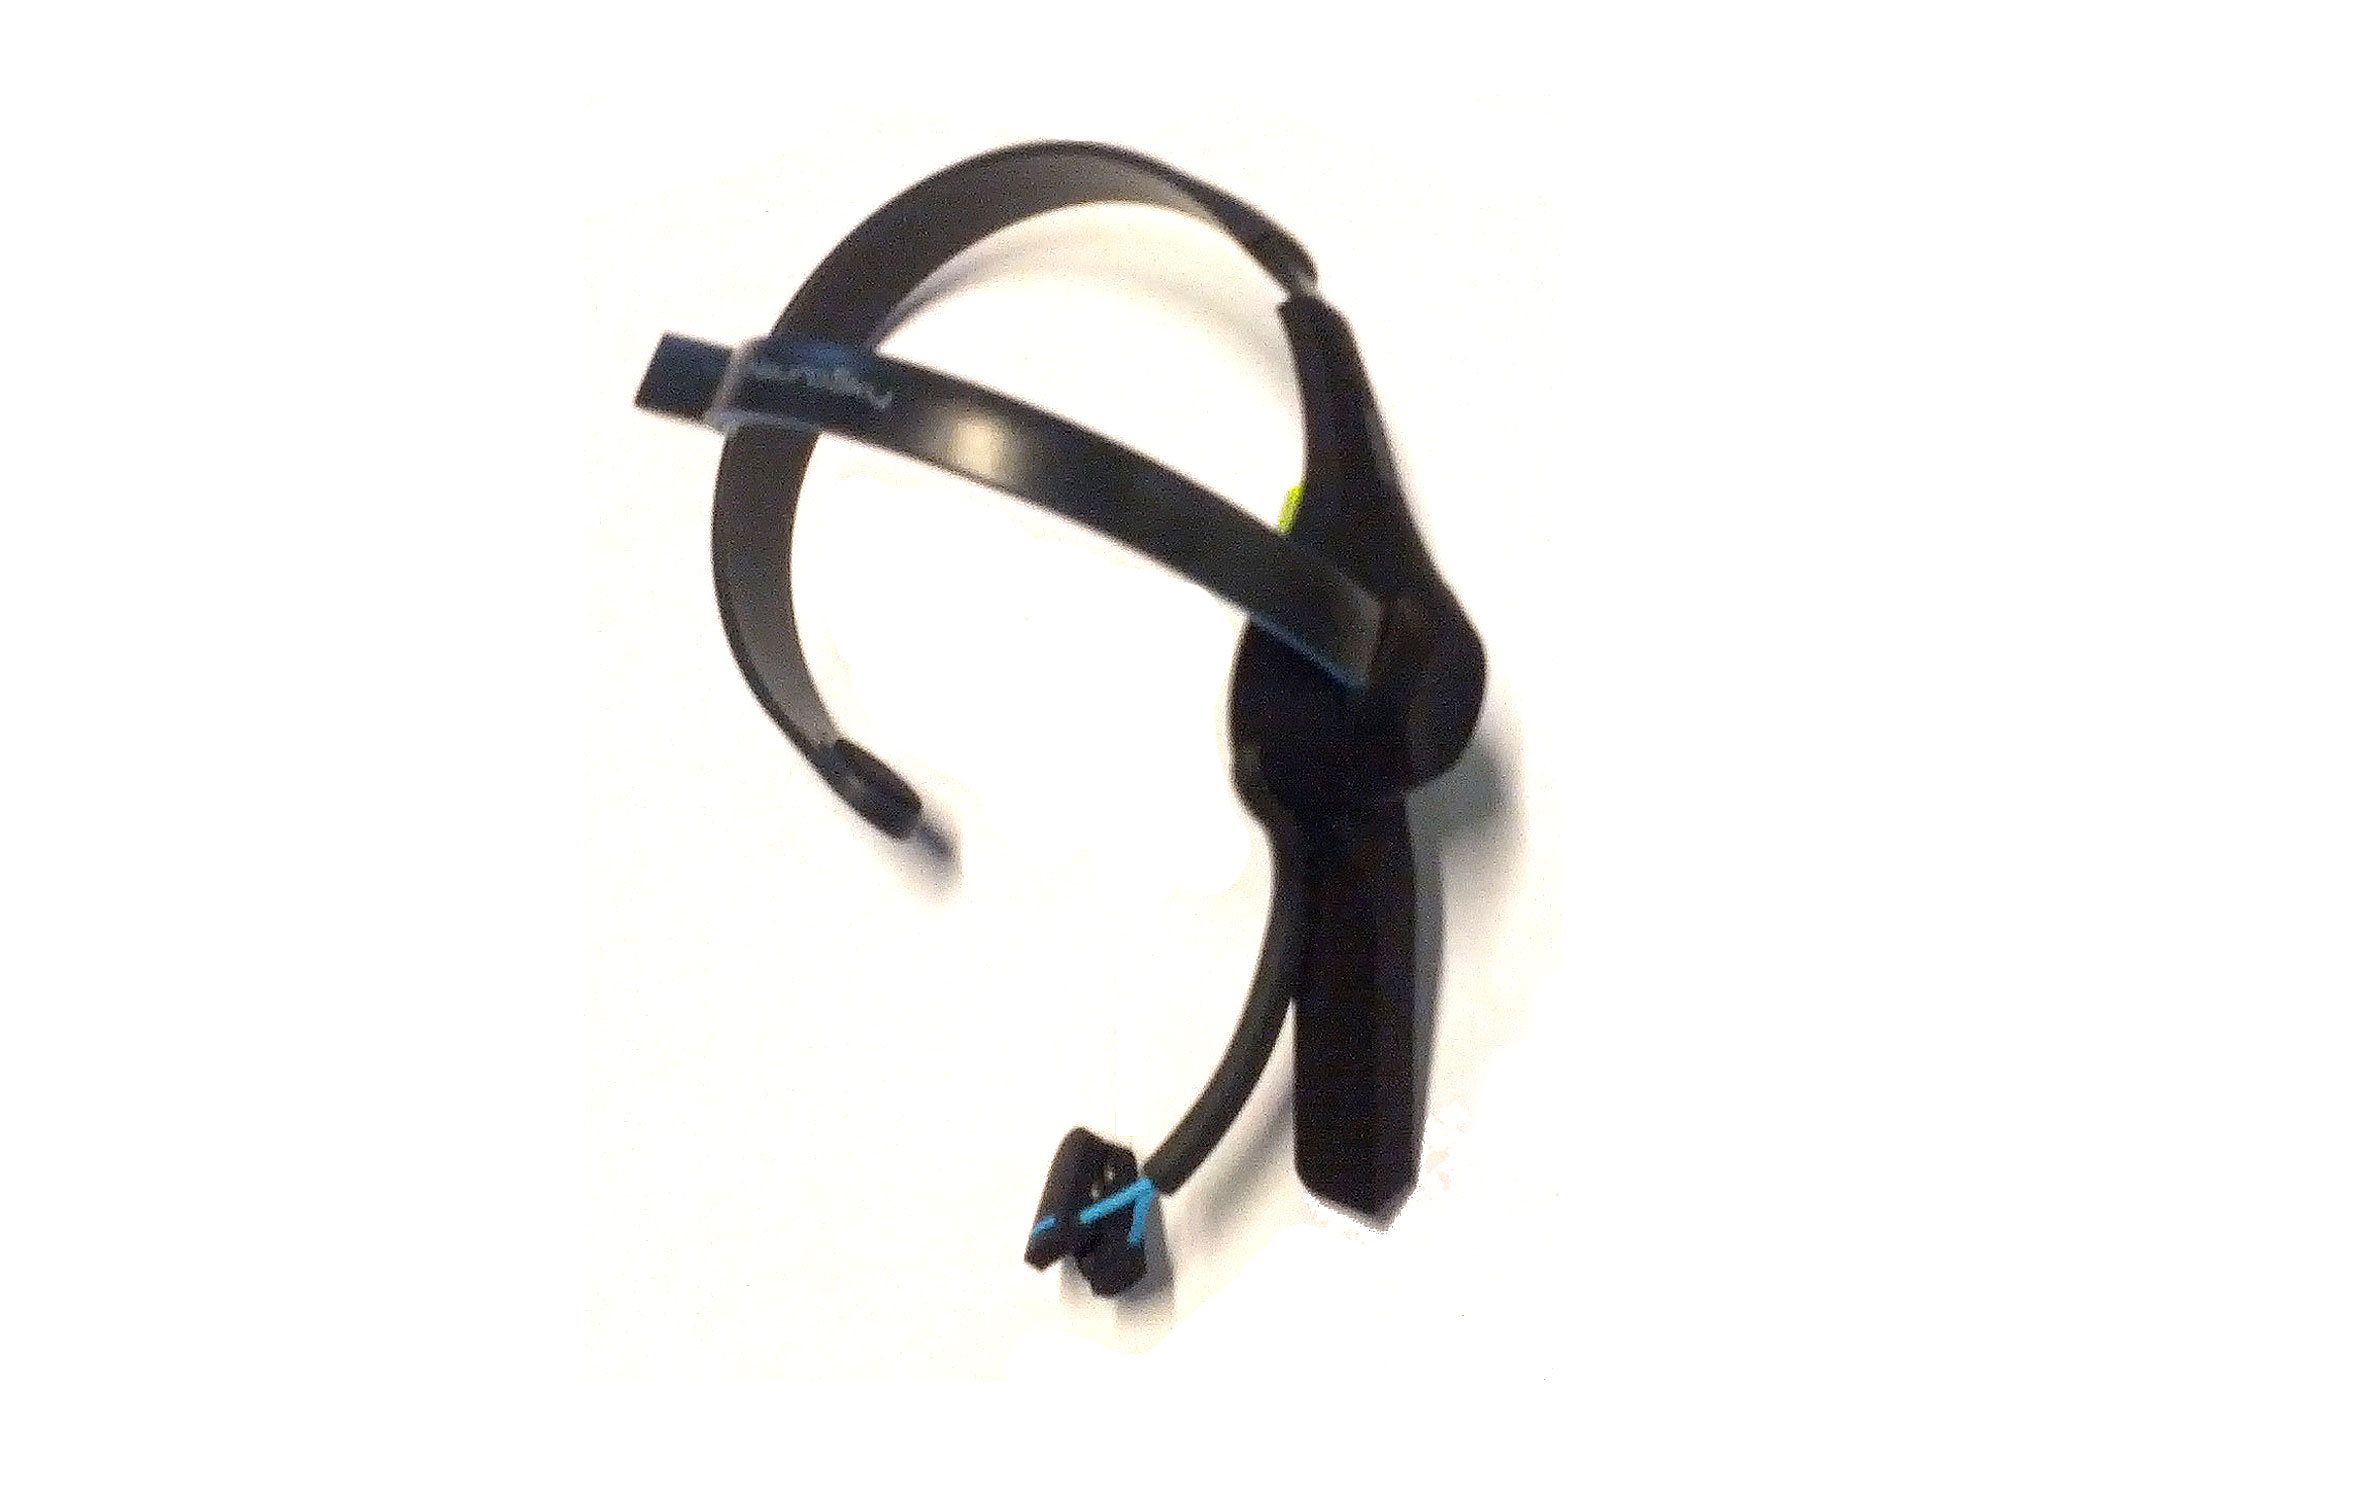 neburisky net mobile : Pics Photos - Neurosky Mindwave Headset From Neurosky Com